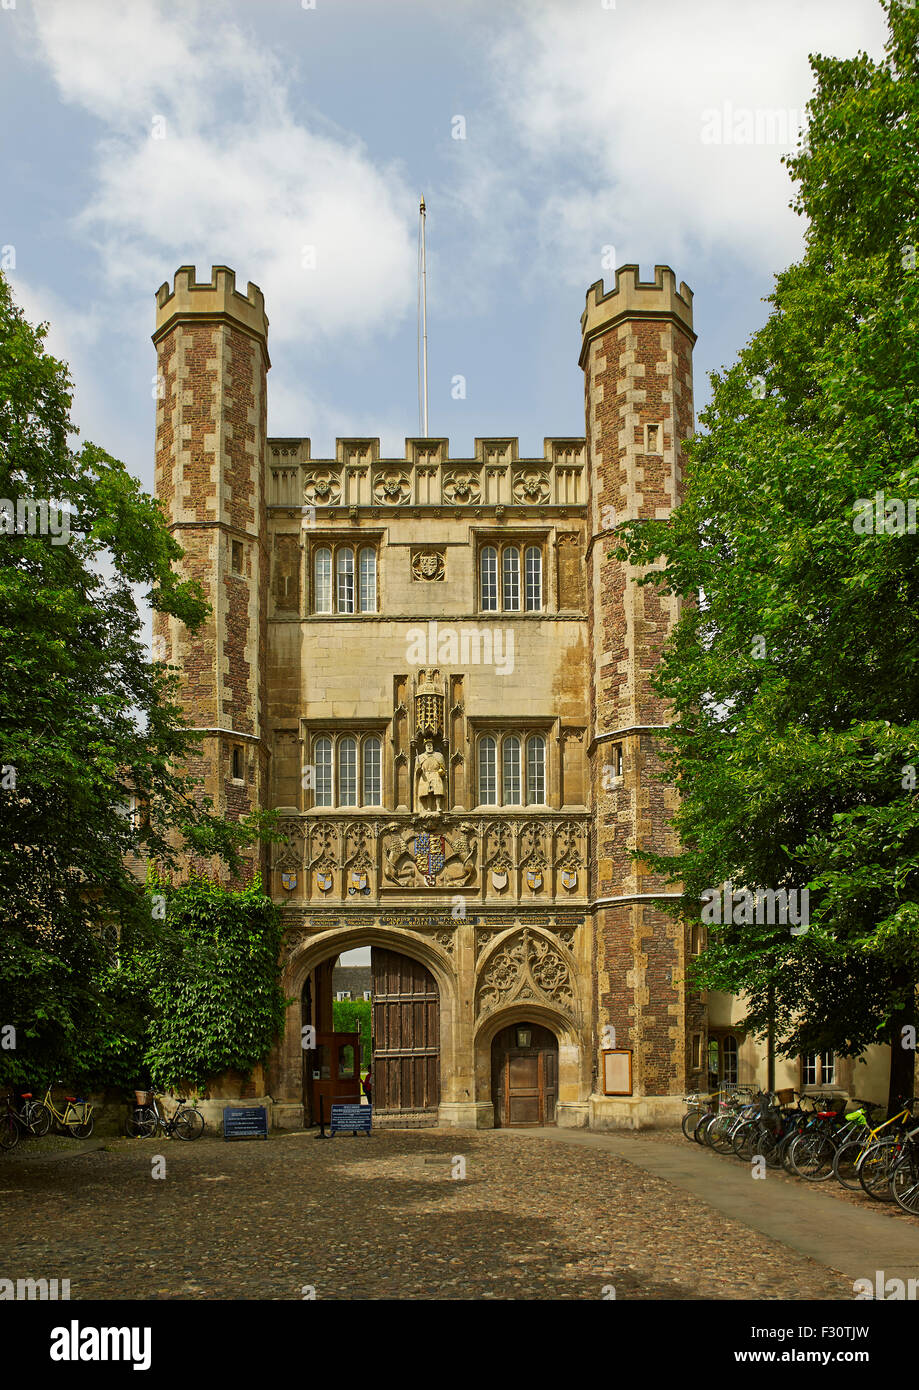 Cambridge University, Trinity College Great Gate - Stock Image